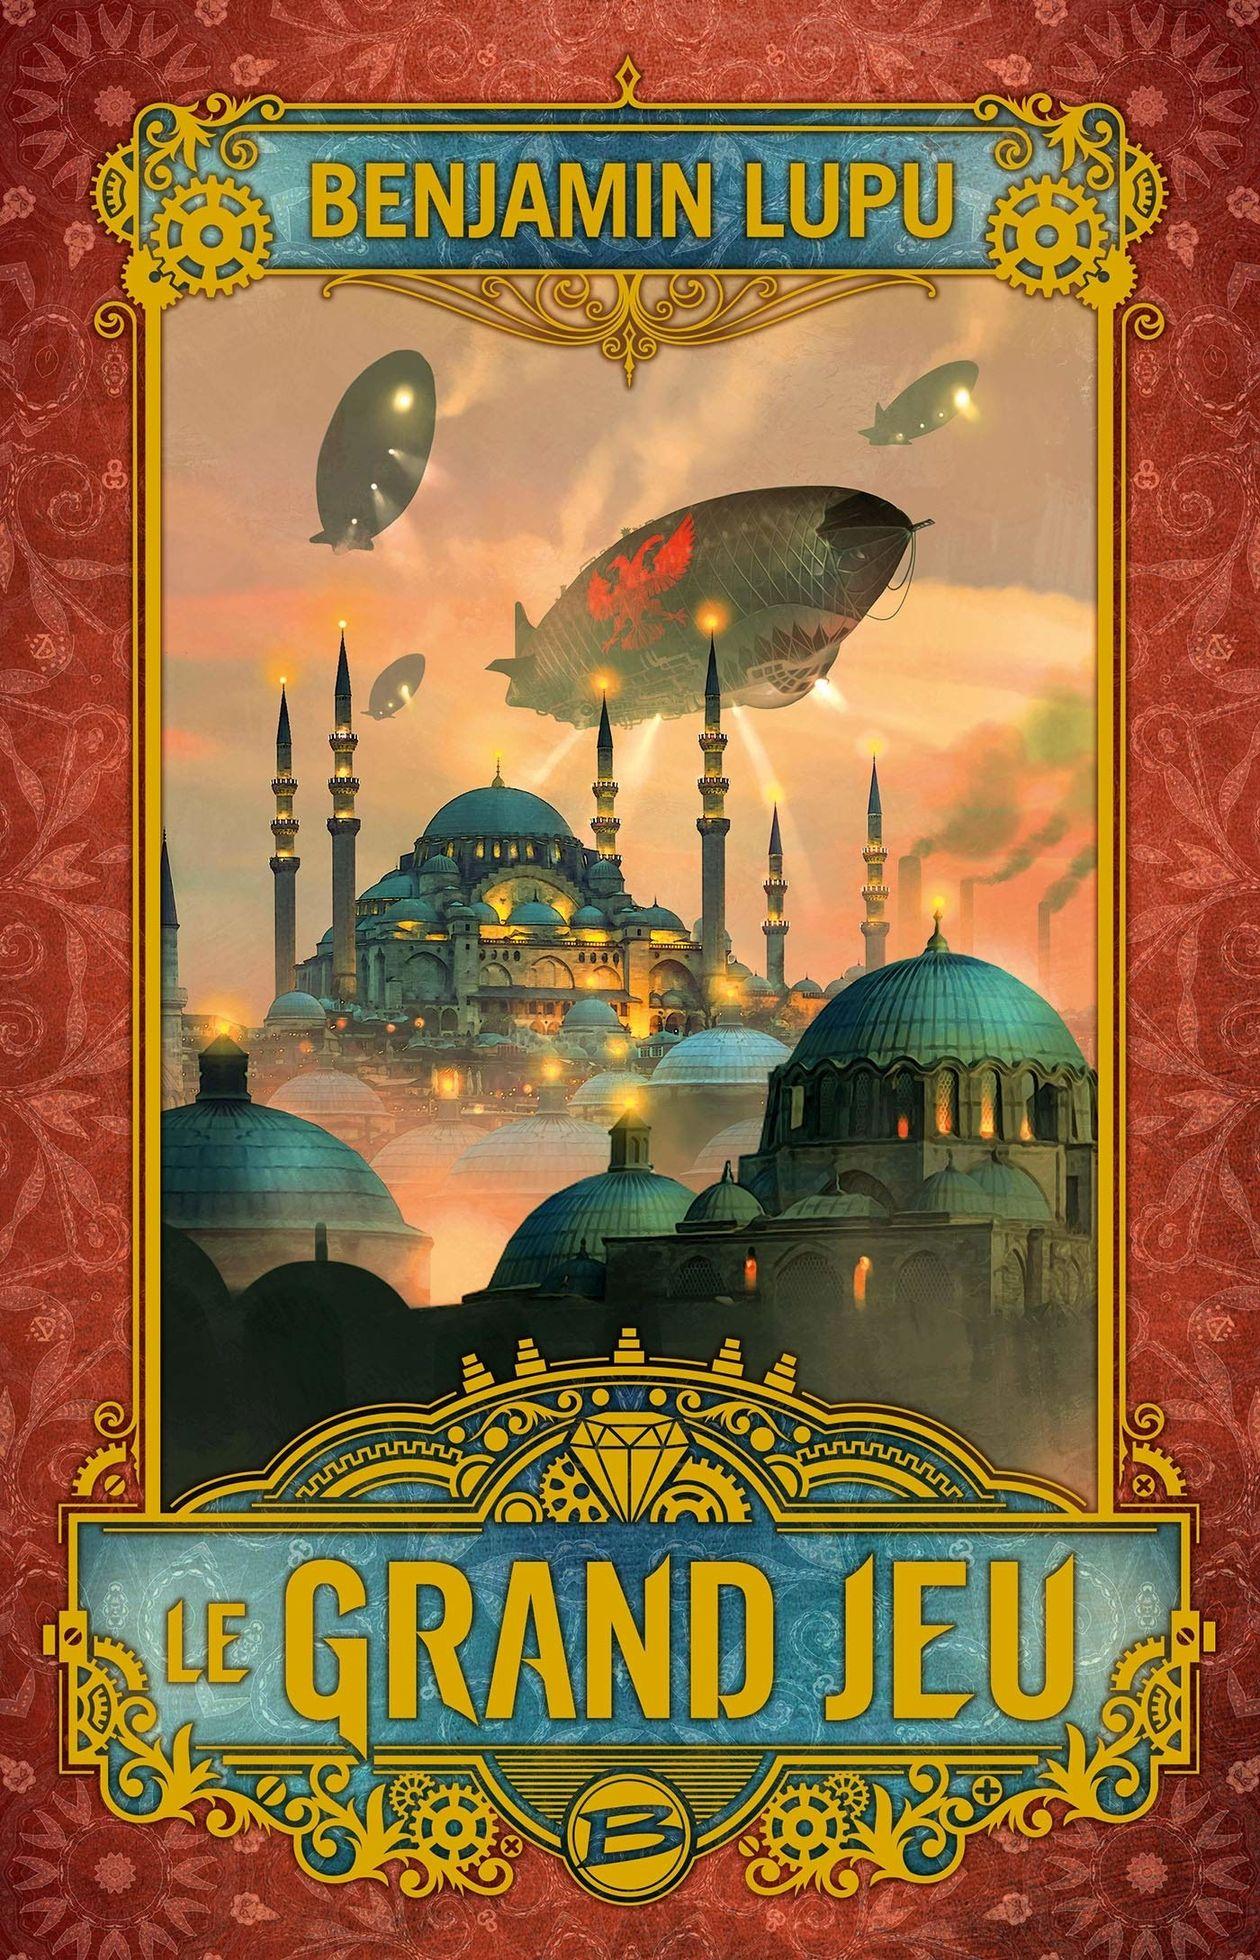 Rencontre steampunk avec Benjamin Lupu pour découvrir son roman Le Grand Jeu !